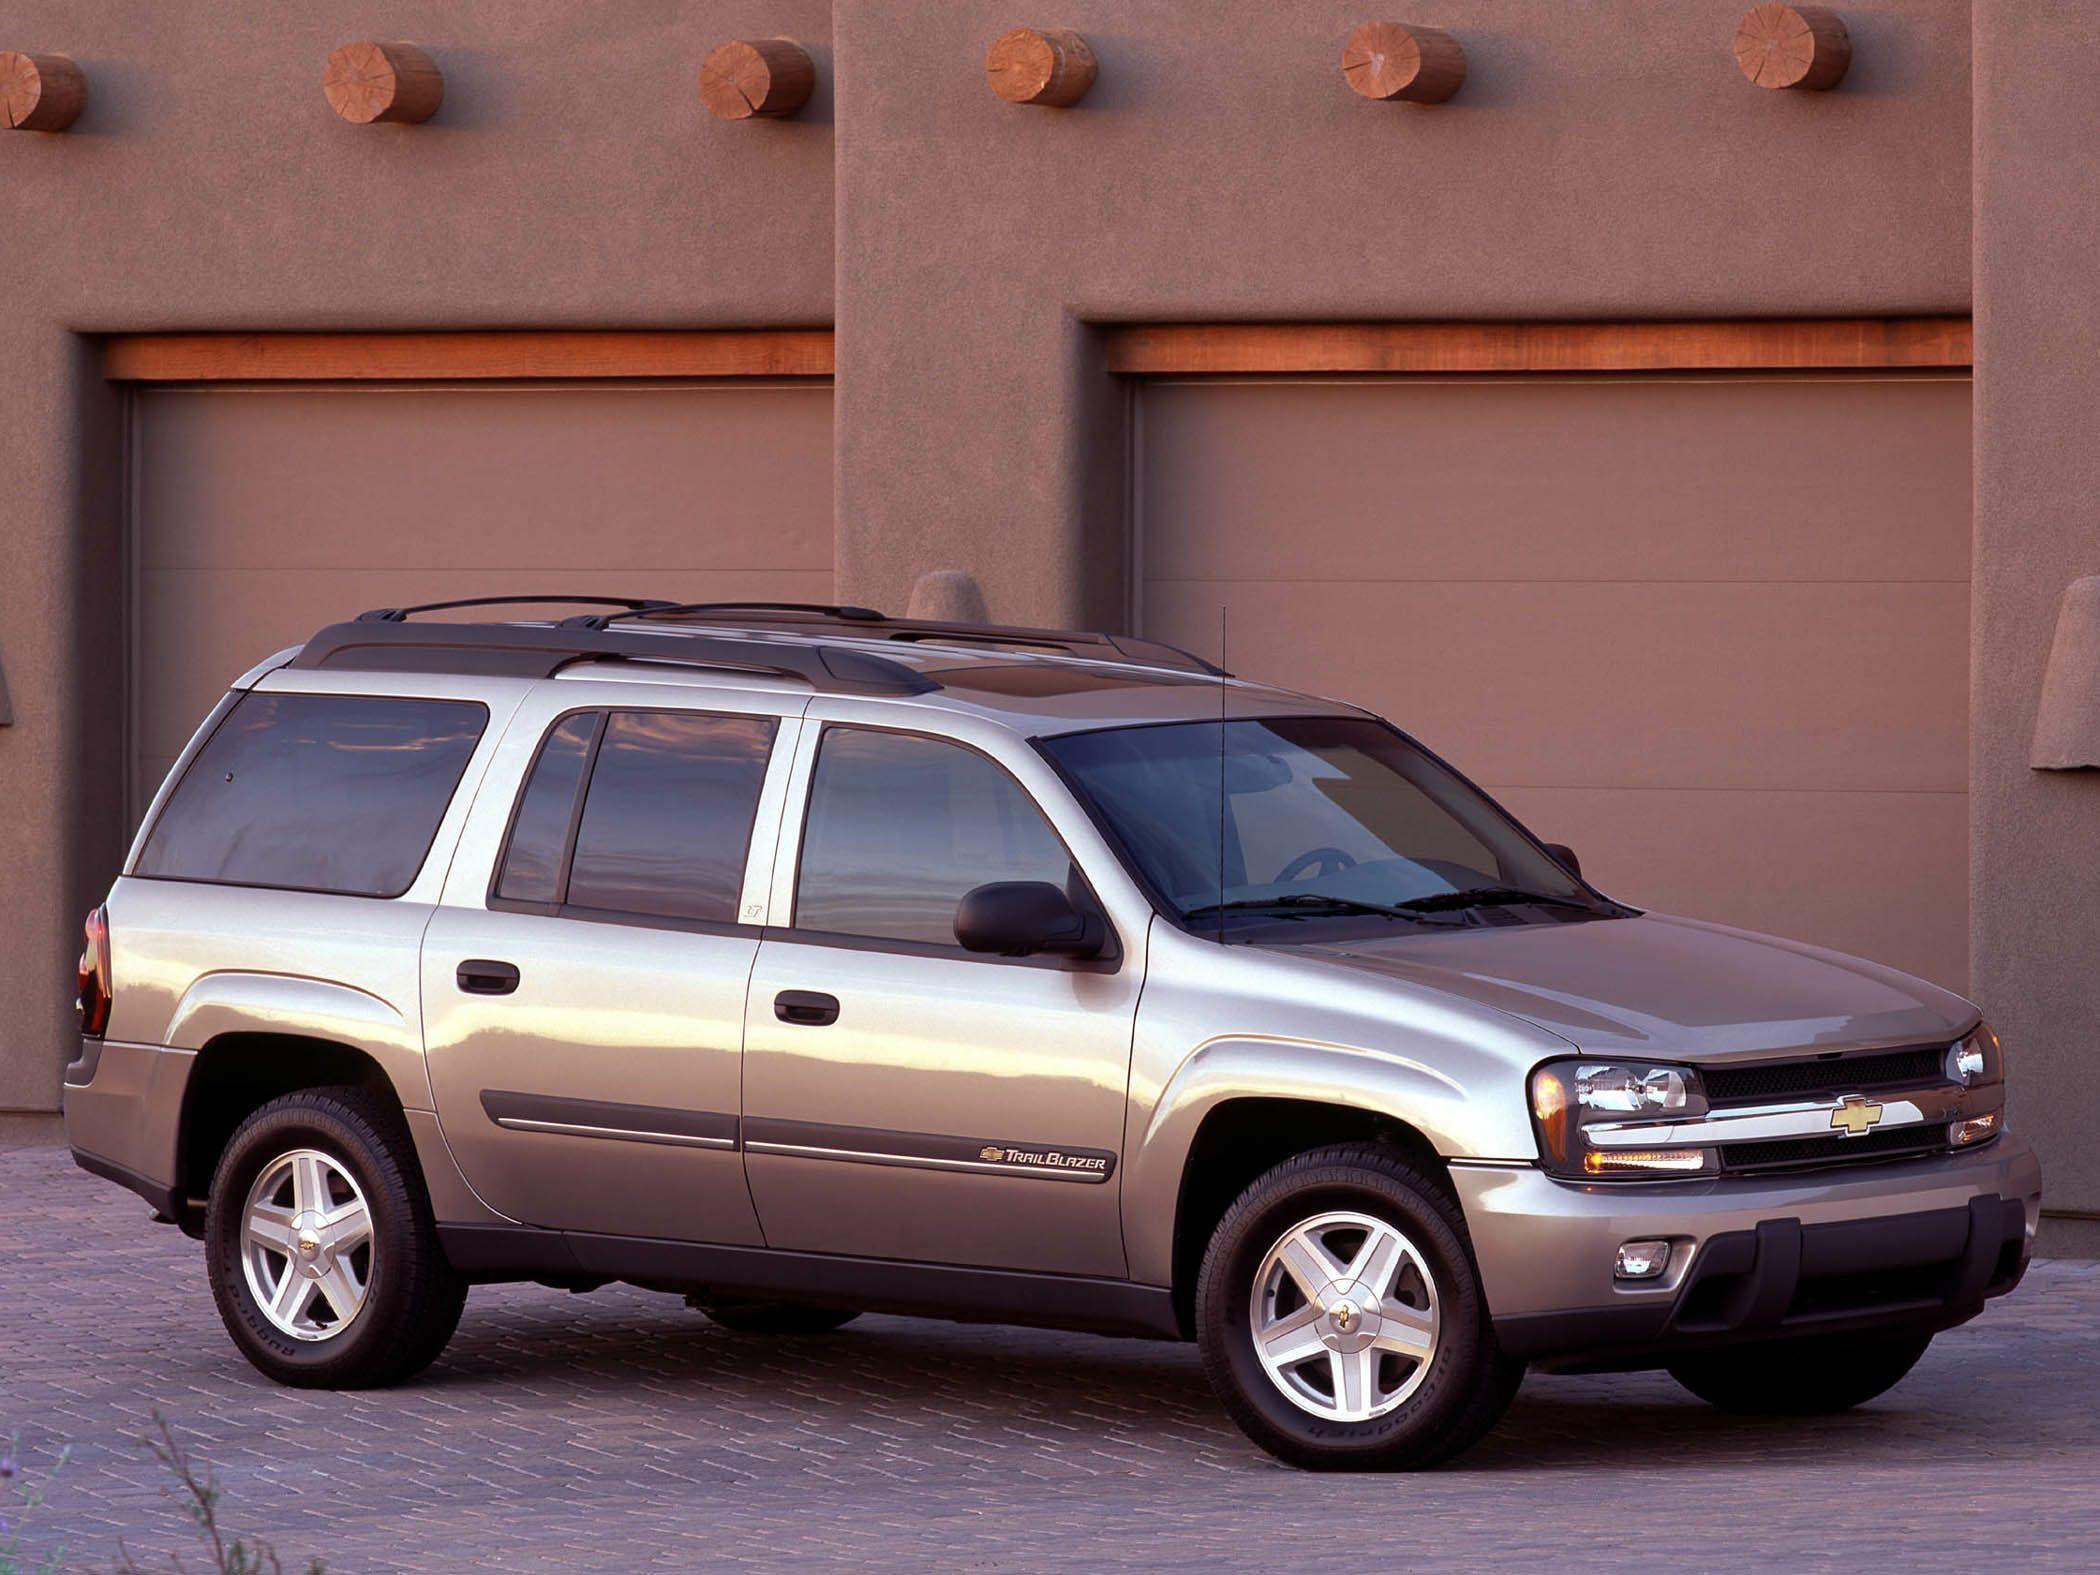 2003 Chevrolet TrailBlazer EXT LS 4x4